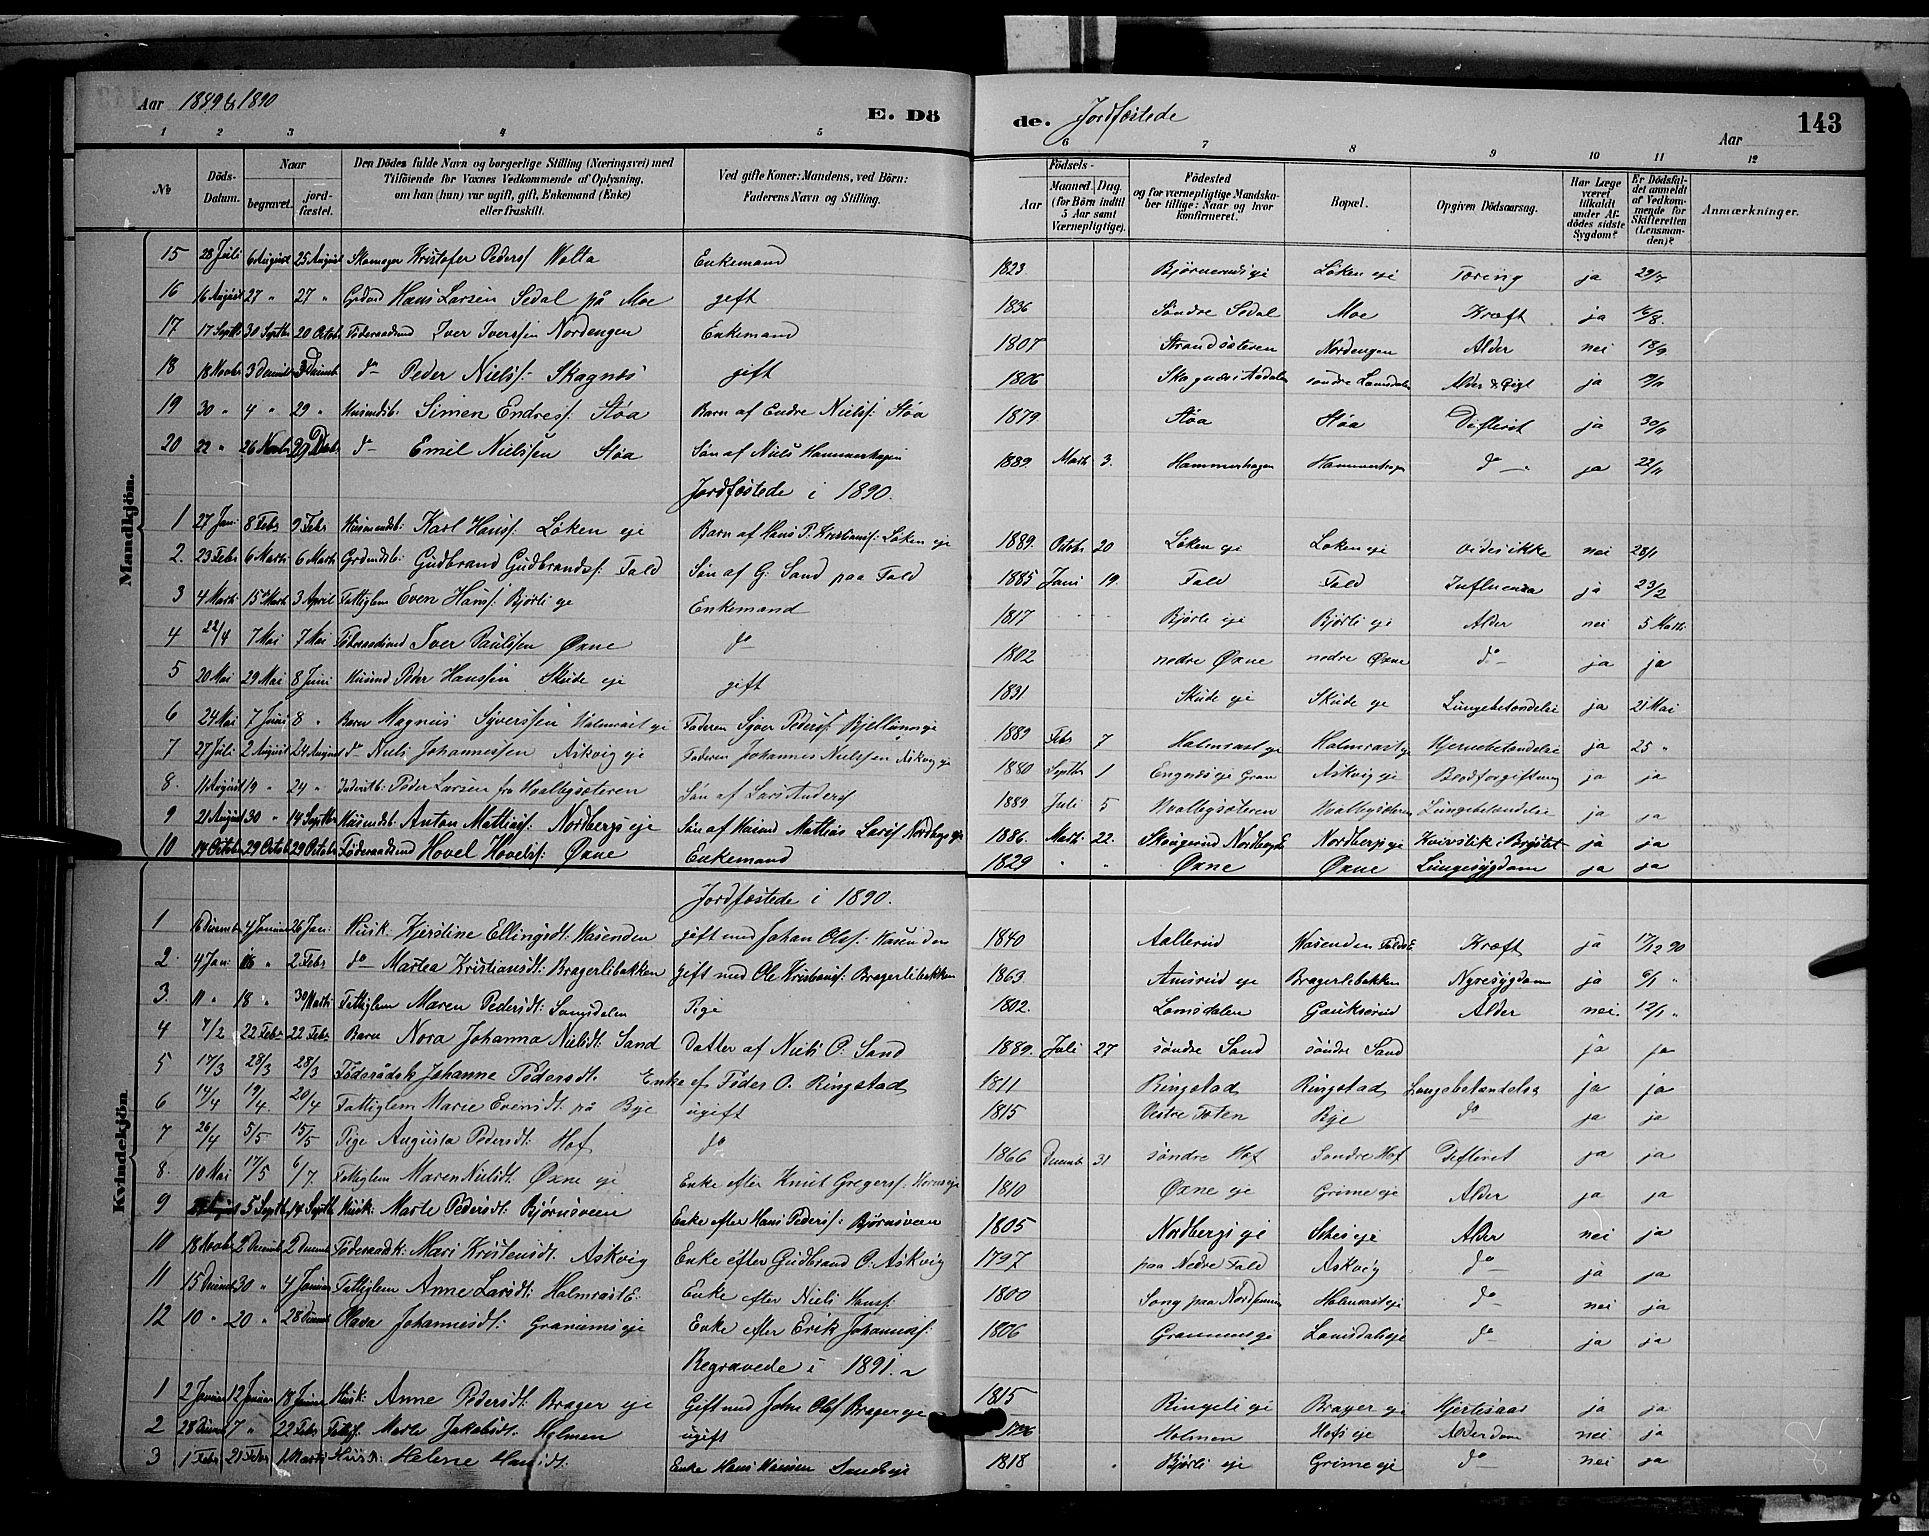 SAH, Søndre Land prestekontor, L/L0002: Klokkerbok nr. 2, 1884-1900, s. 143